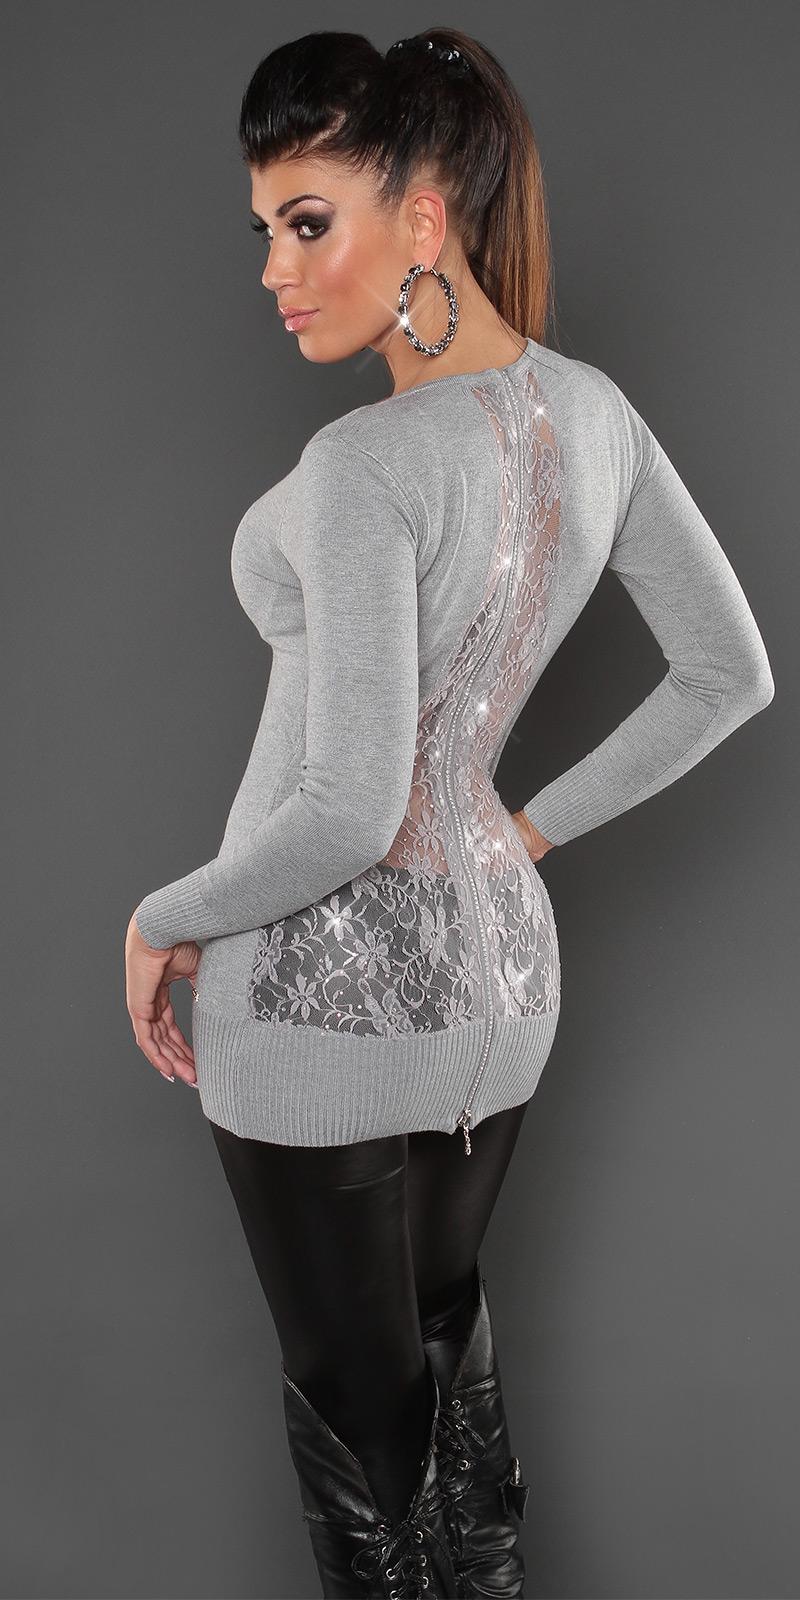 koucla longpulli spitze strass zip pullover longpullover strickkleid sweater gra ebay. Black Bedroom Furniture Sets. Home Design Ideas